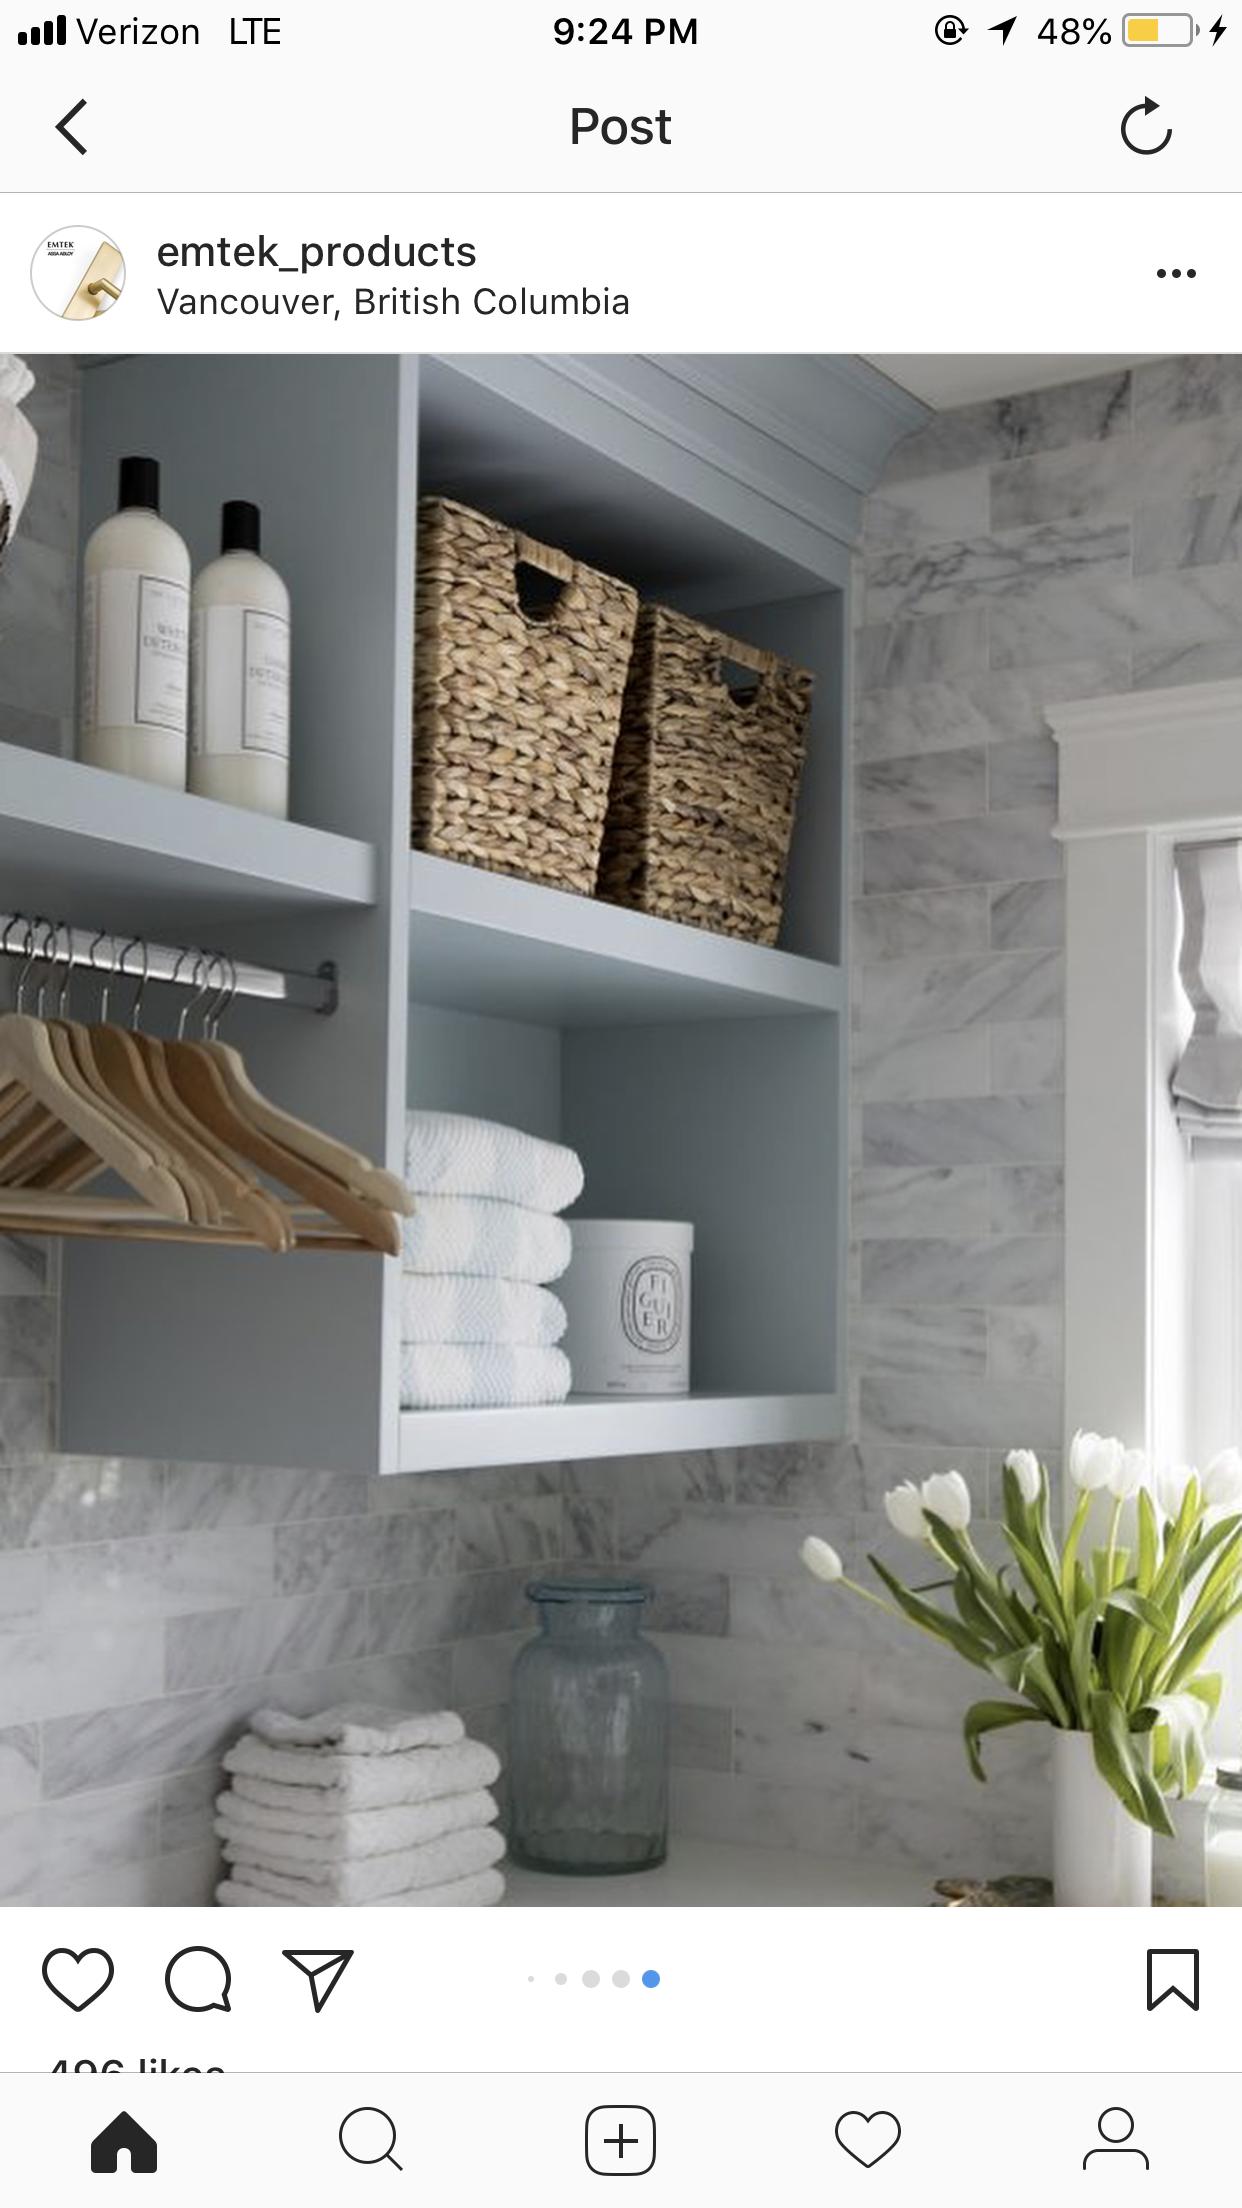 example of carerra marble tiles for backsplash in kitchen our home rh pinterest com Ceramic Tile Kitchen Backsplash Glass Backsplash for Kitchens